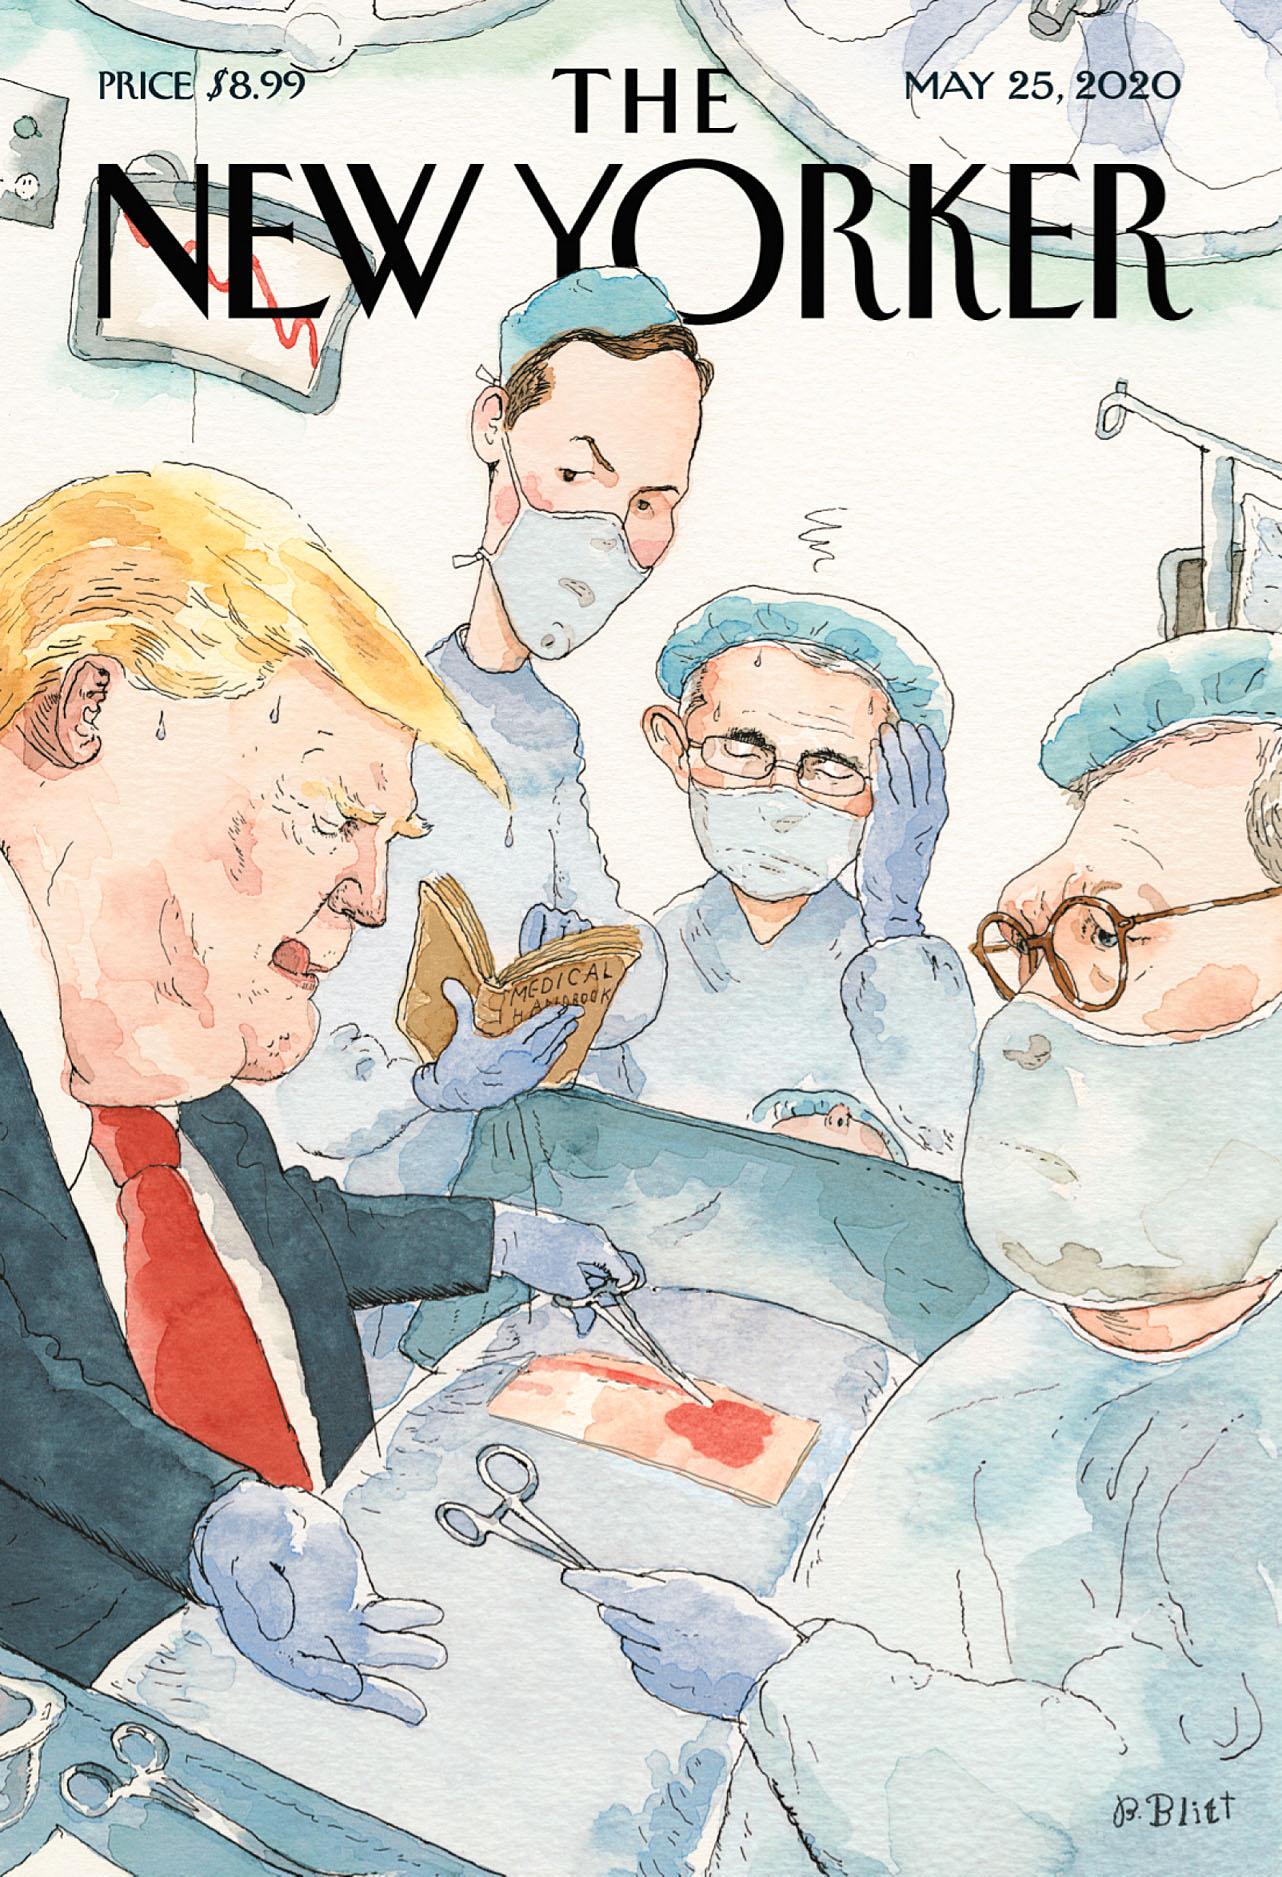 New Yorker 200525.jpg